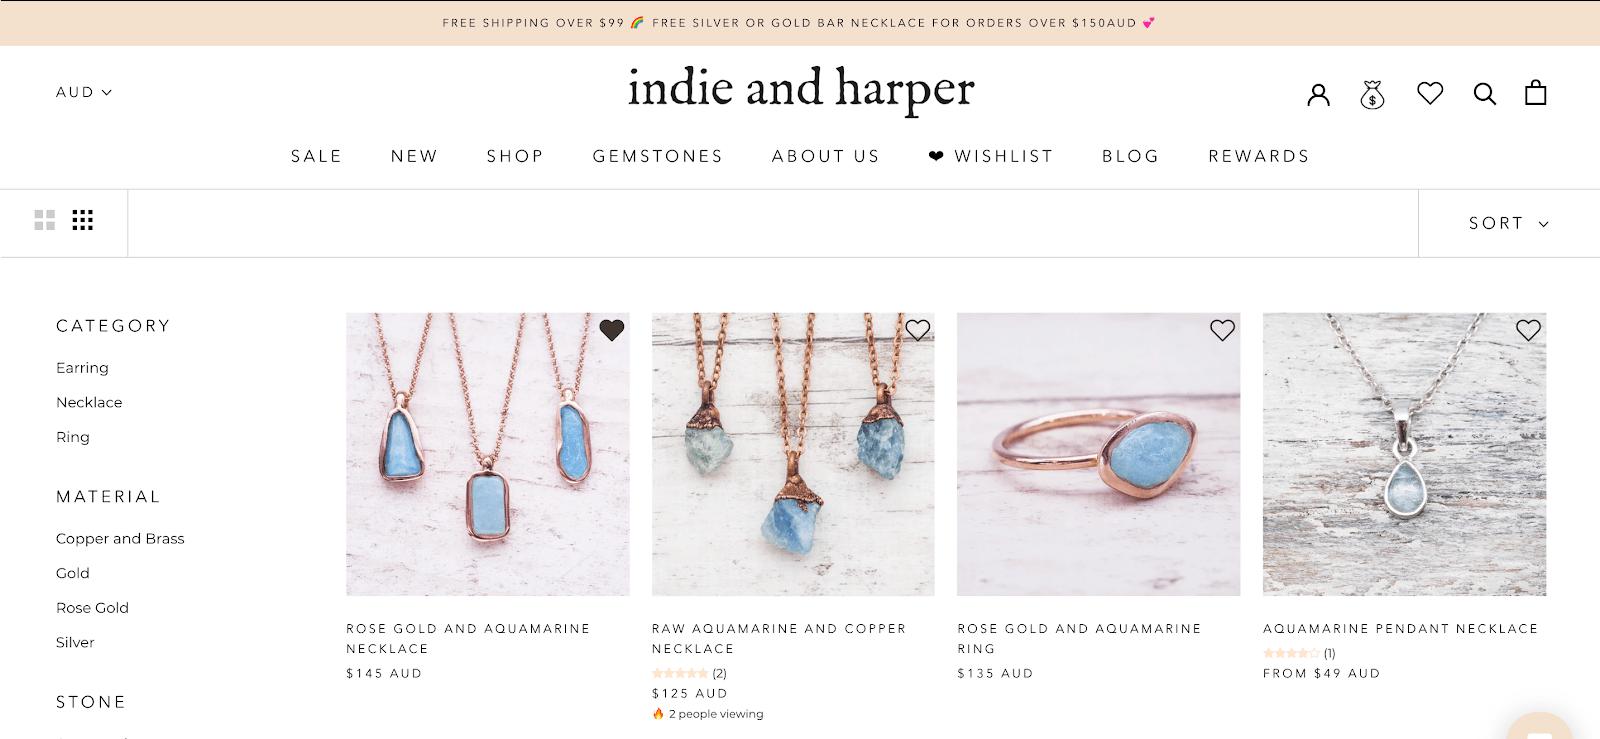 indie-and-harper-wishlist-customer-account-page